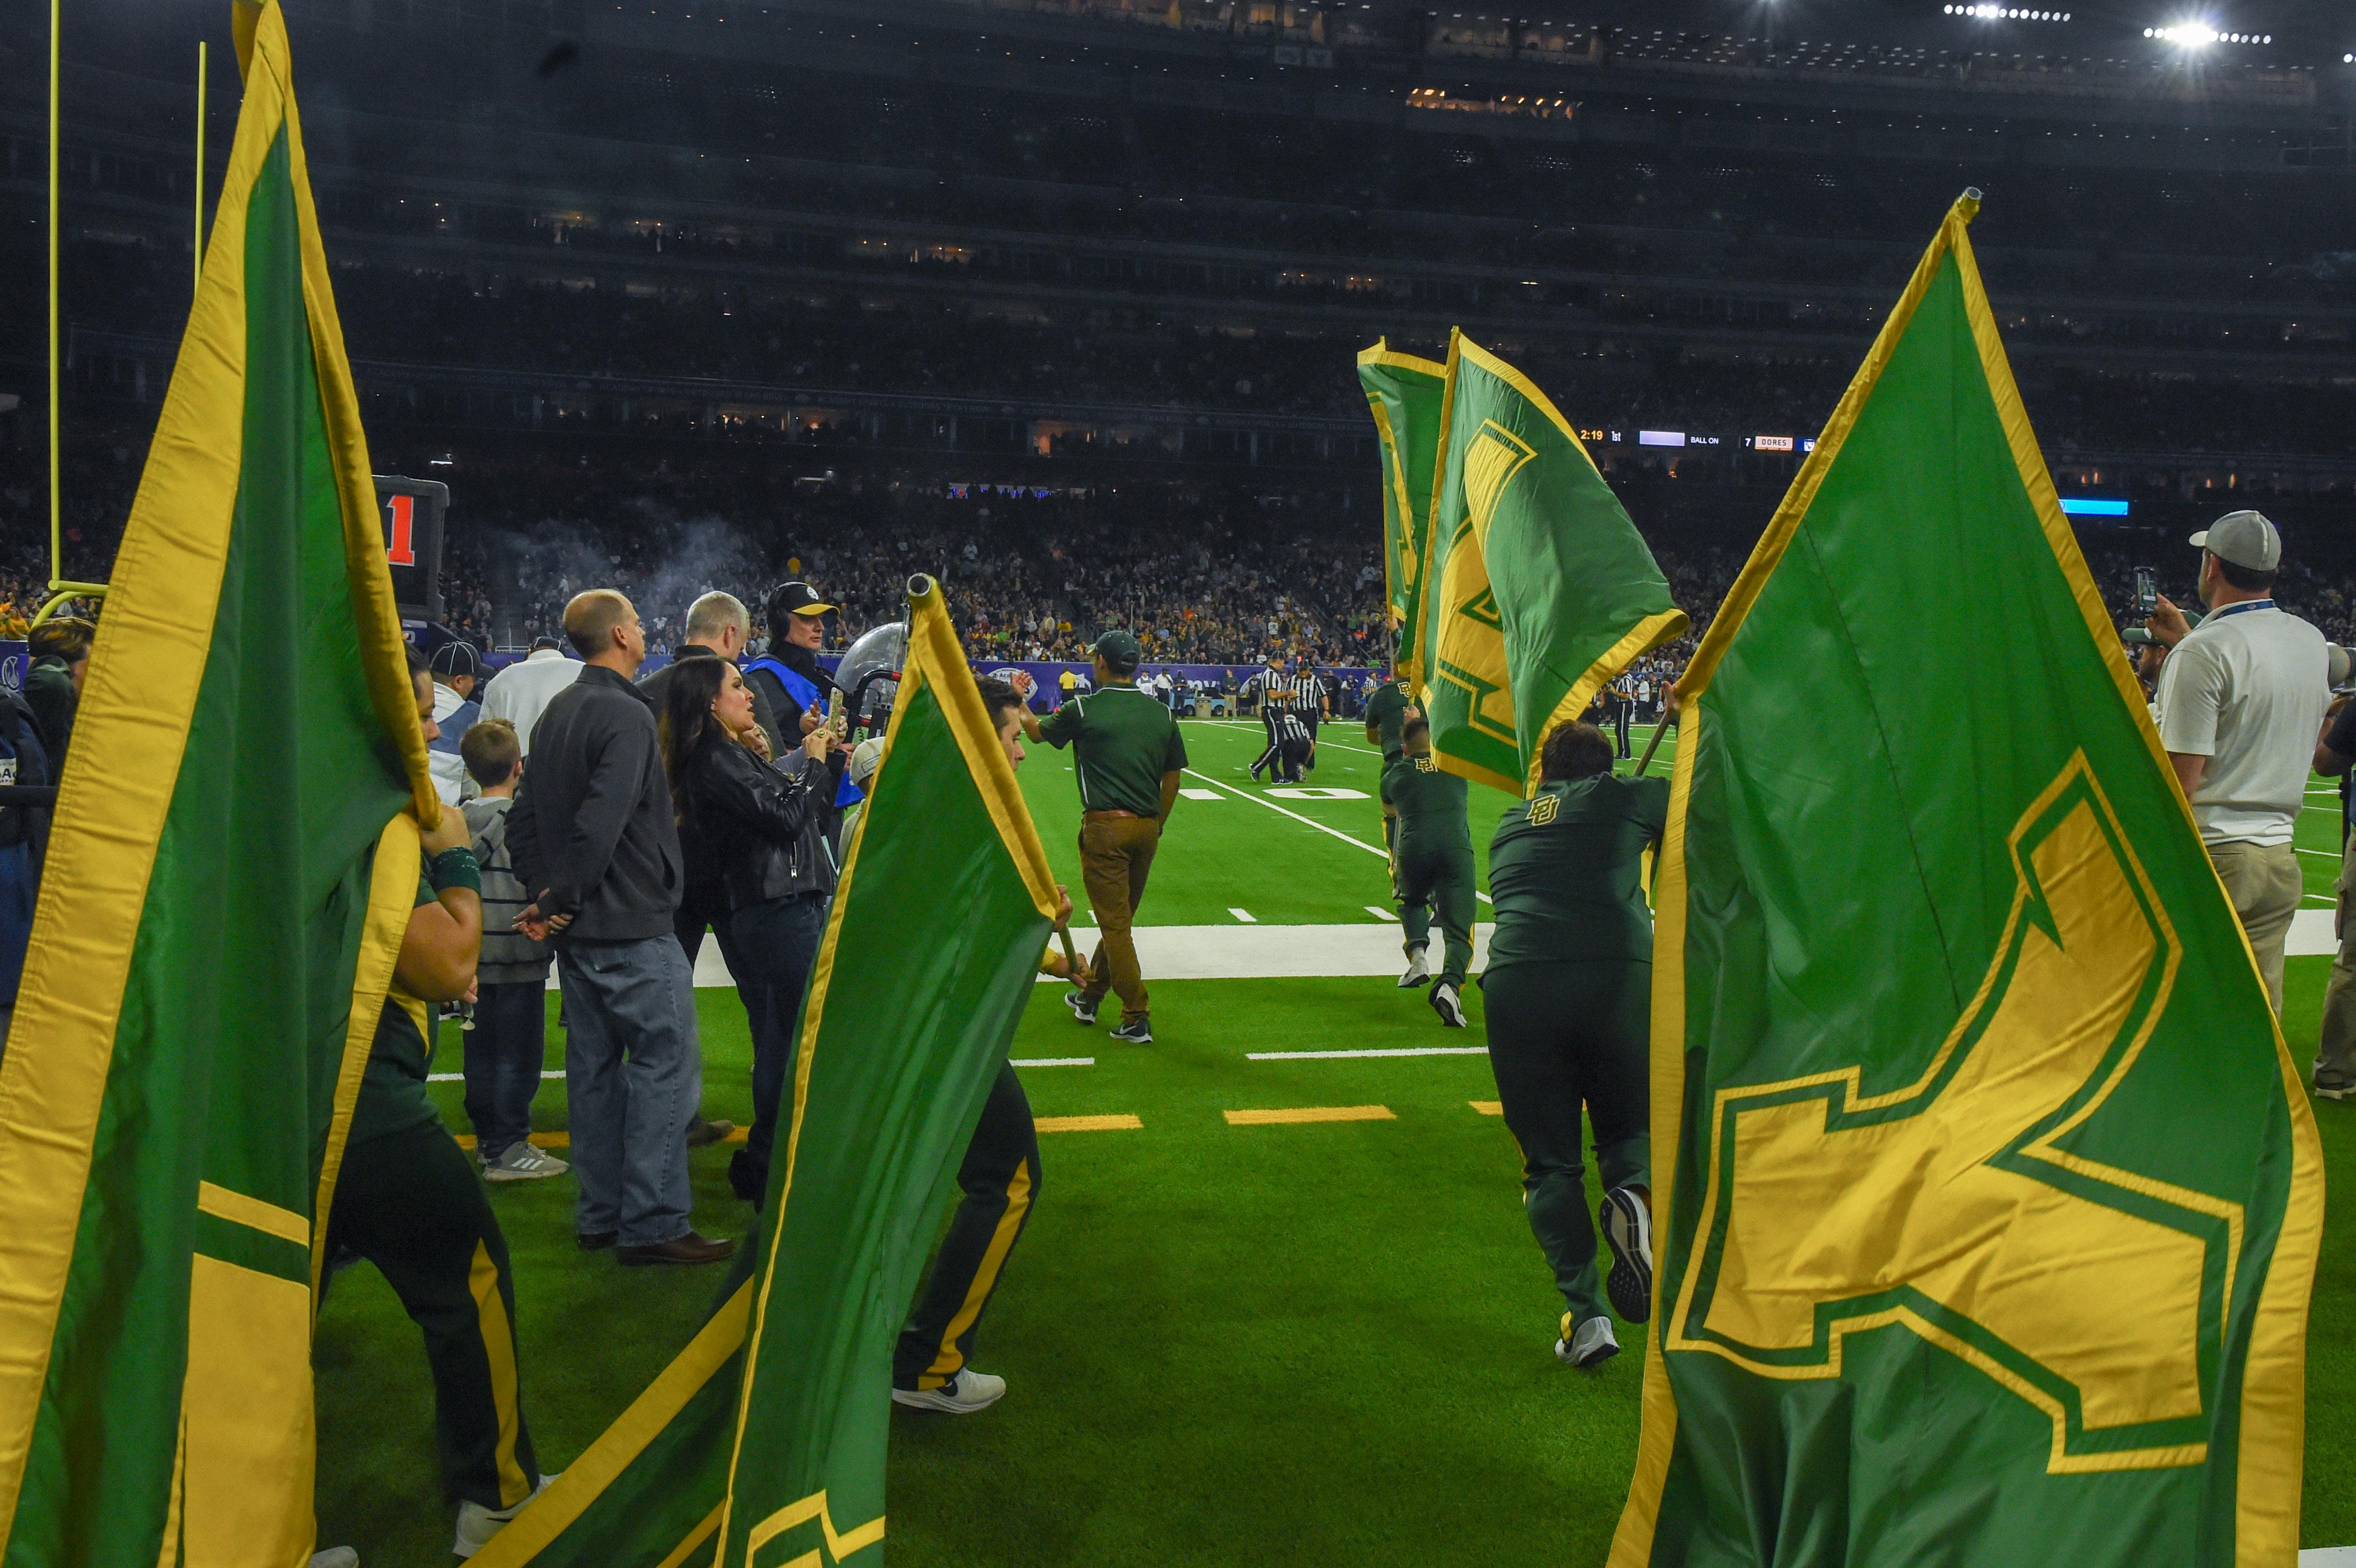 COLLEGE FOOTBALL: DEC 27 Texas Bowl - Baylor v Vanderbilt